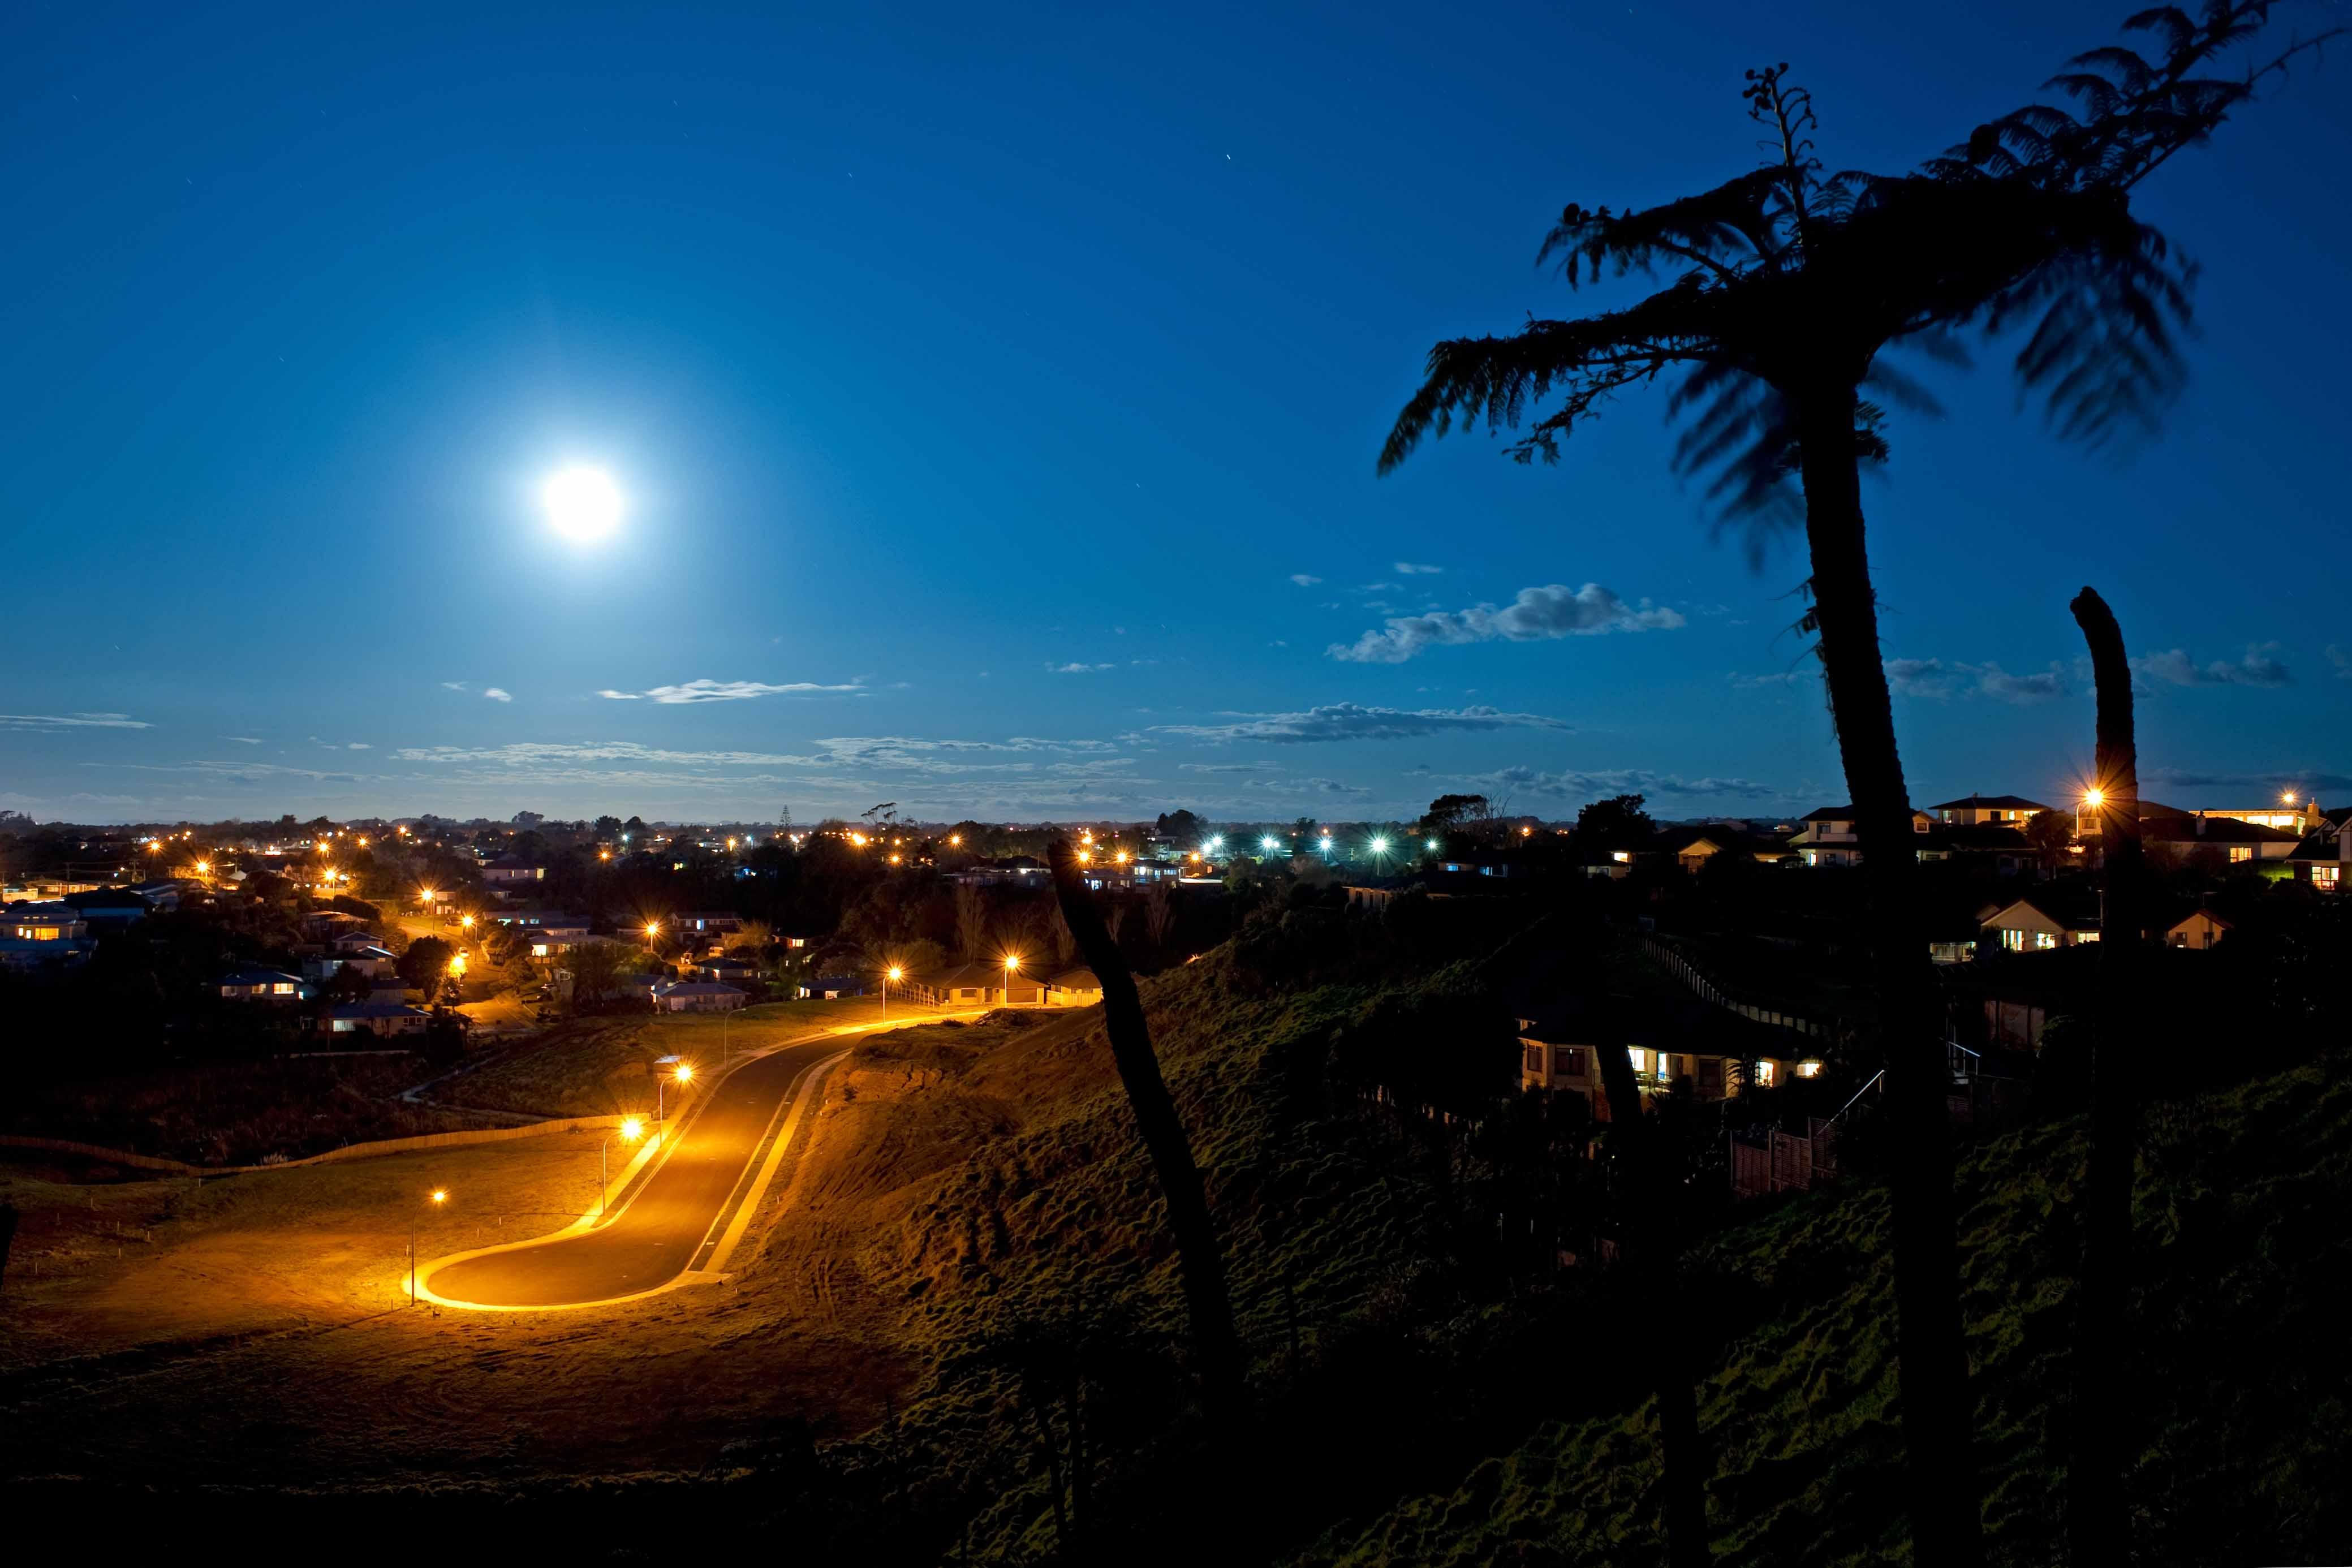 Modest Epiphanies: Moon and cul de sac